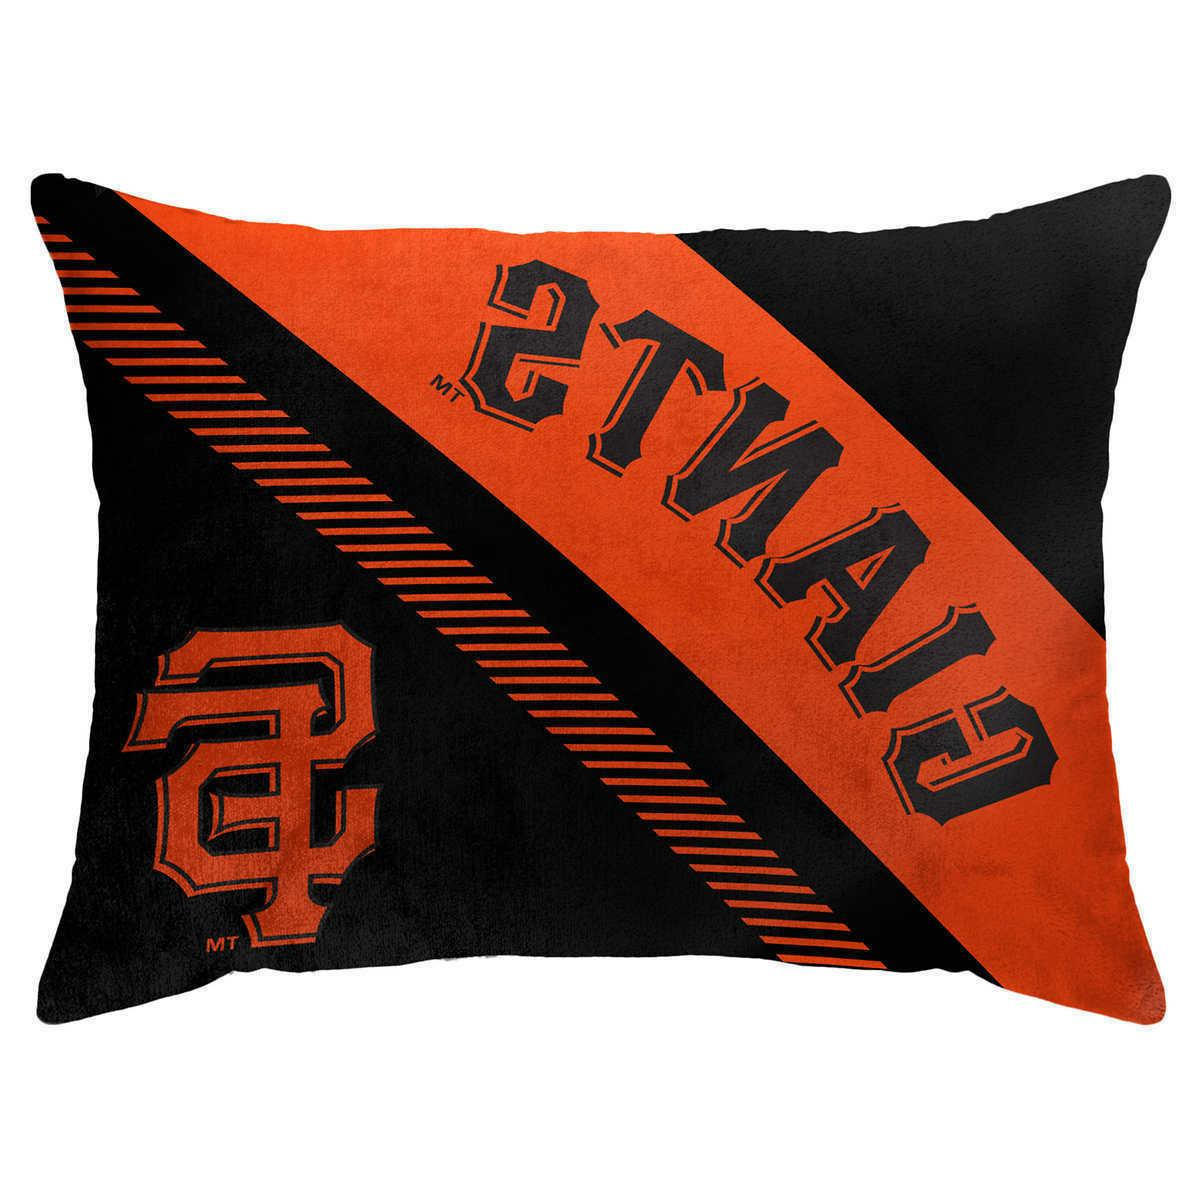 "MLB Plush Pillow 20"" x 26"""